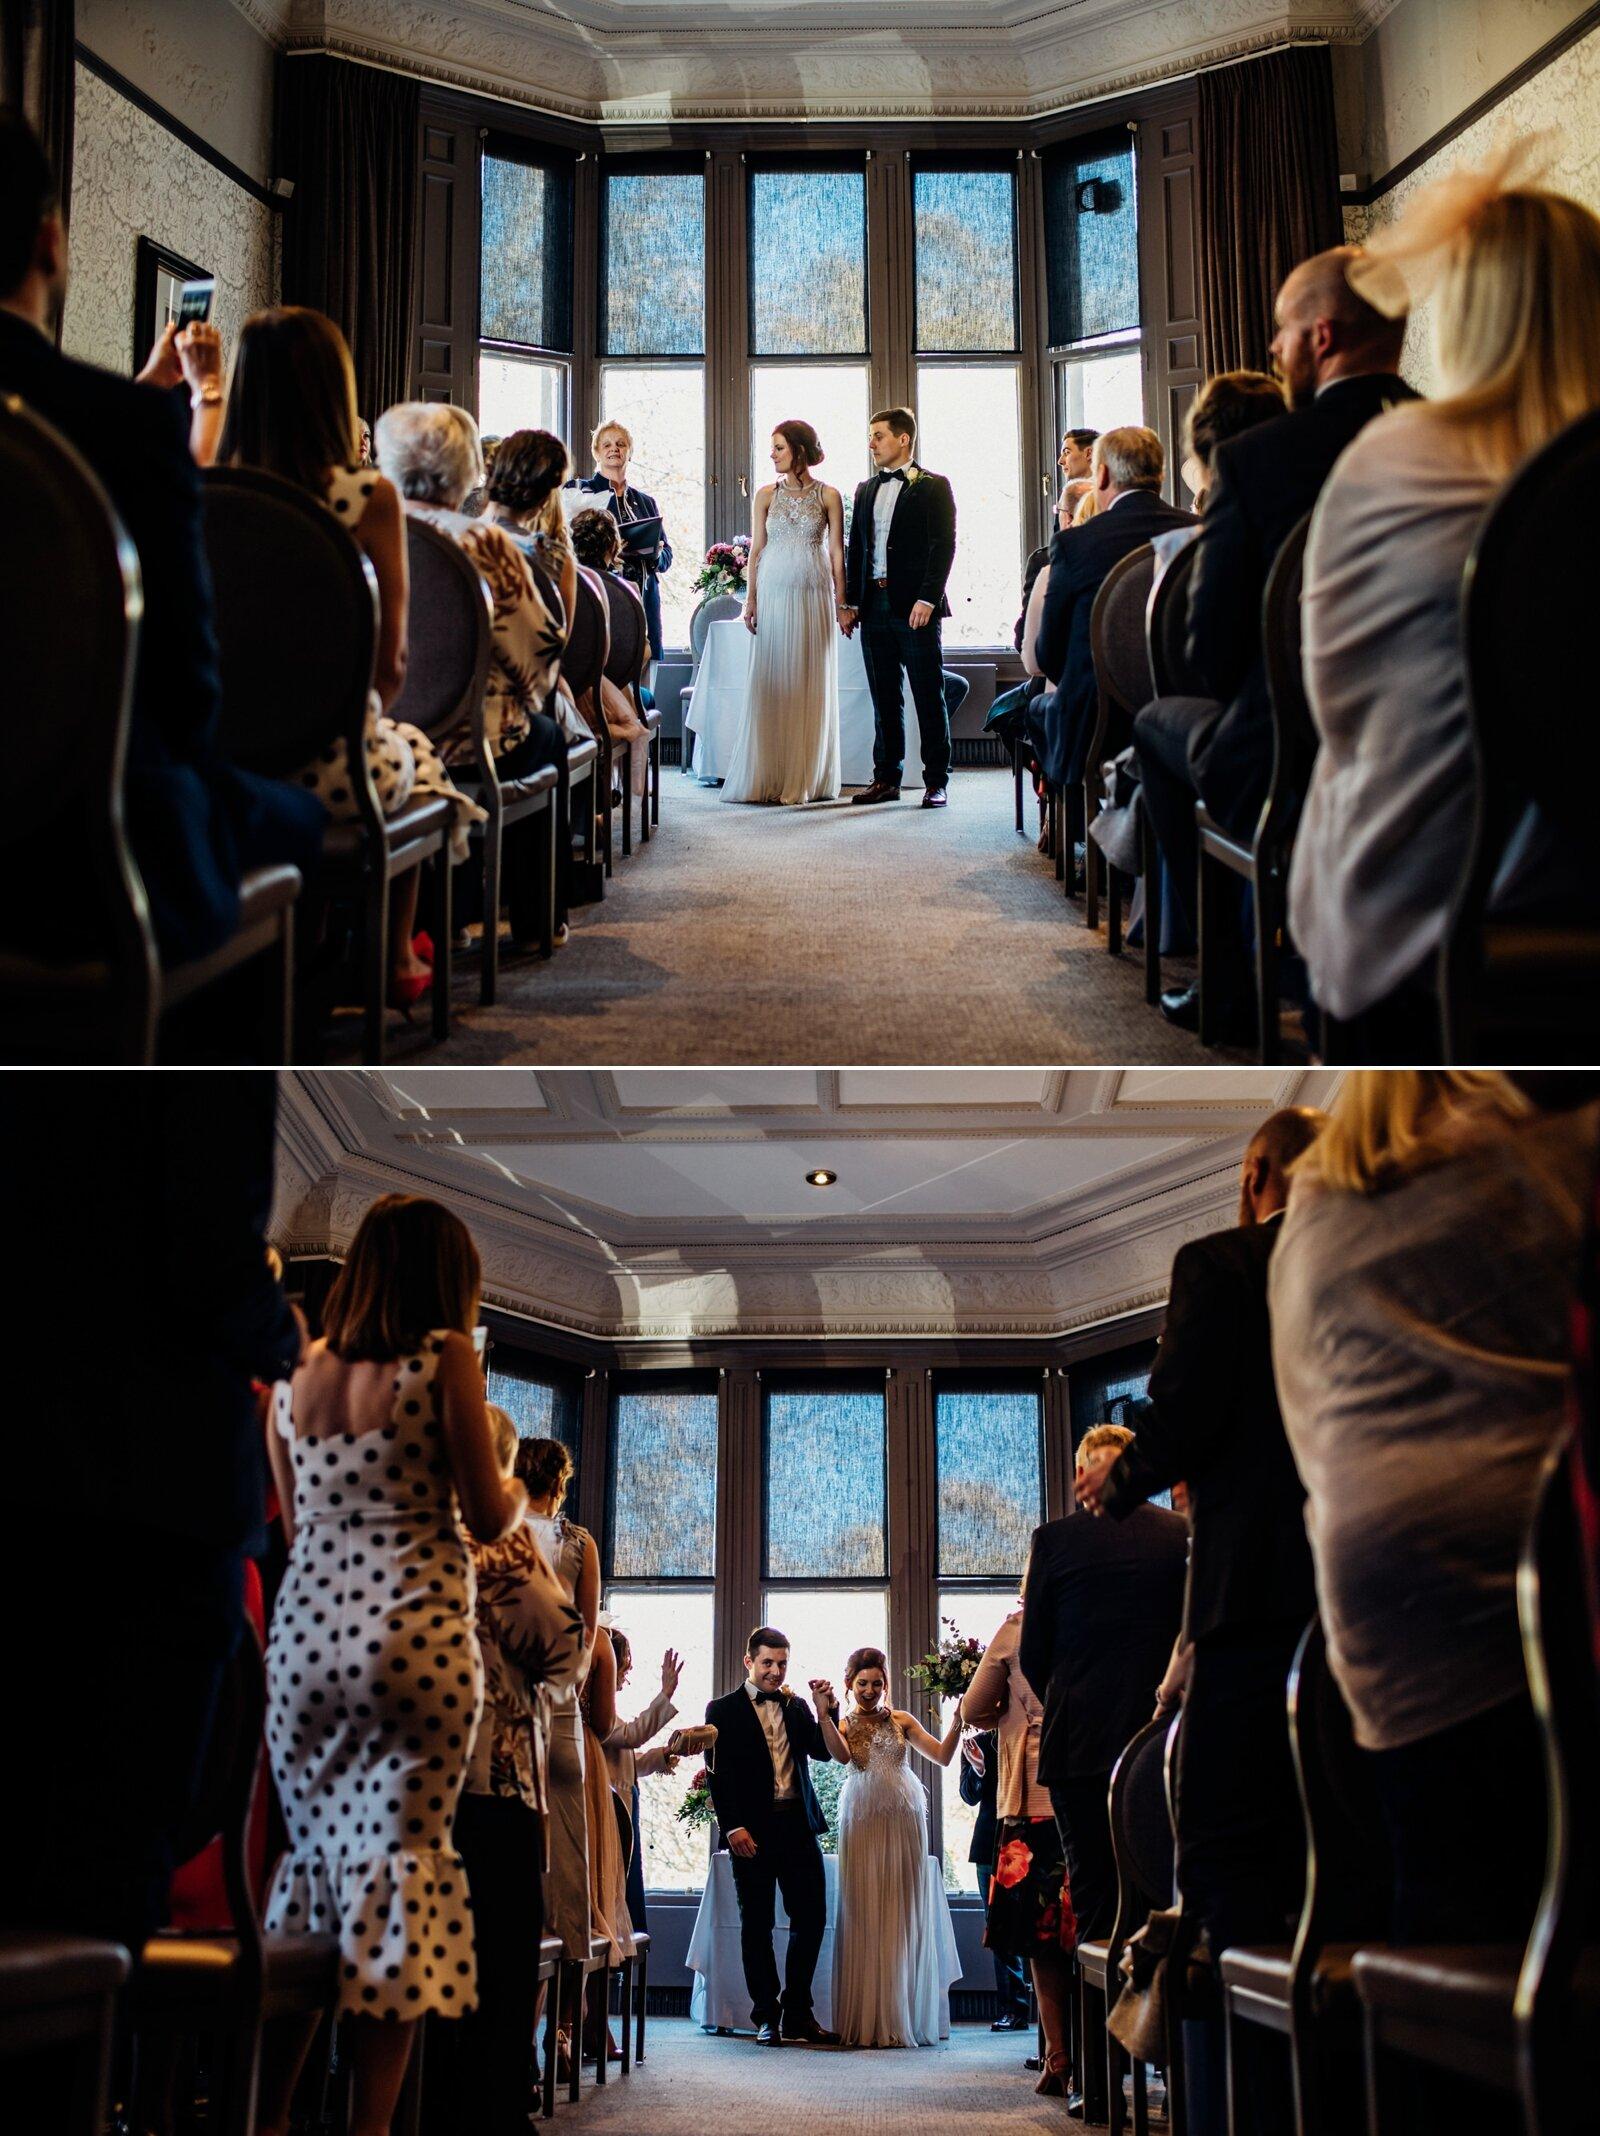 Andy&Szerdi-Photography_Ceremony_Elaine-Stephen-29.jpg